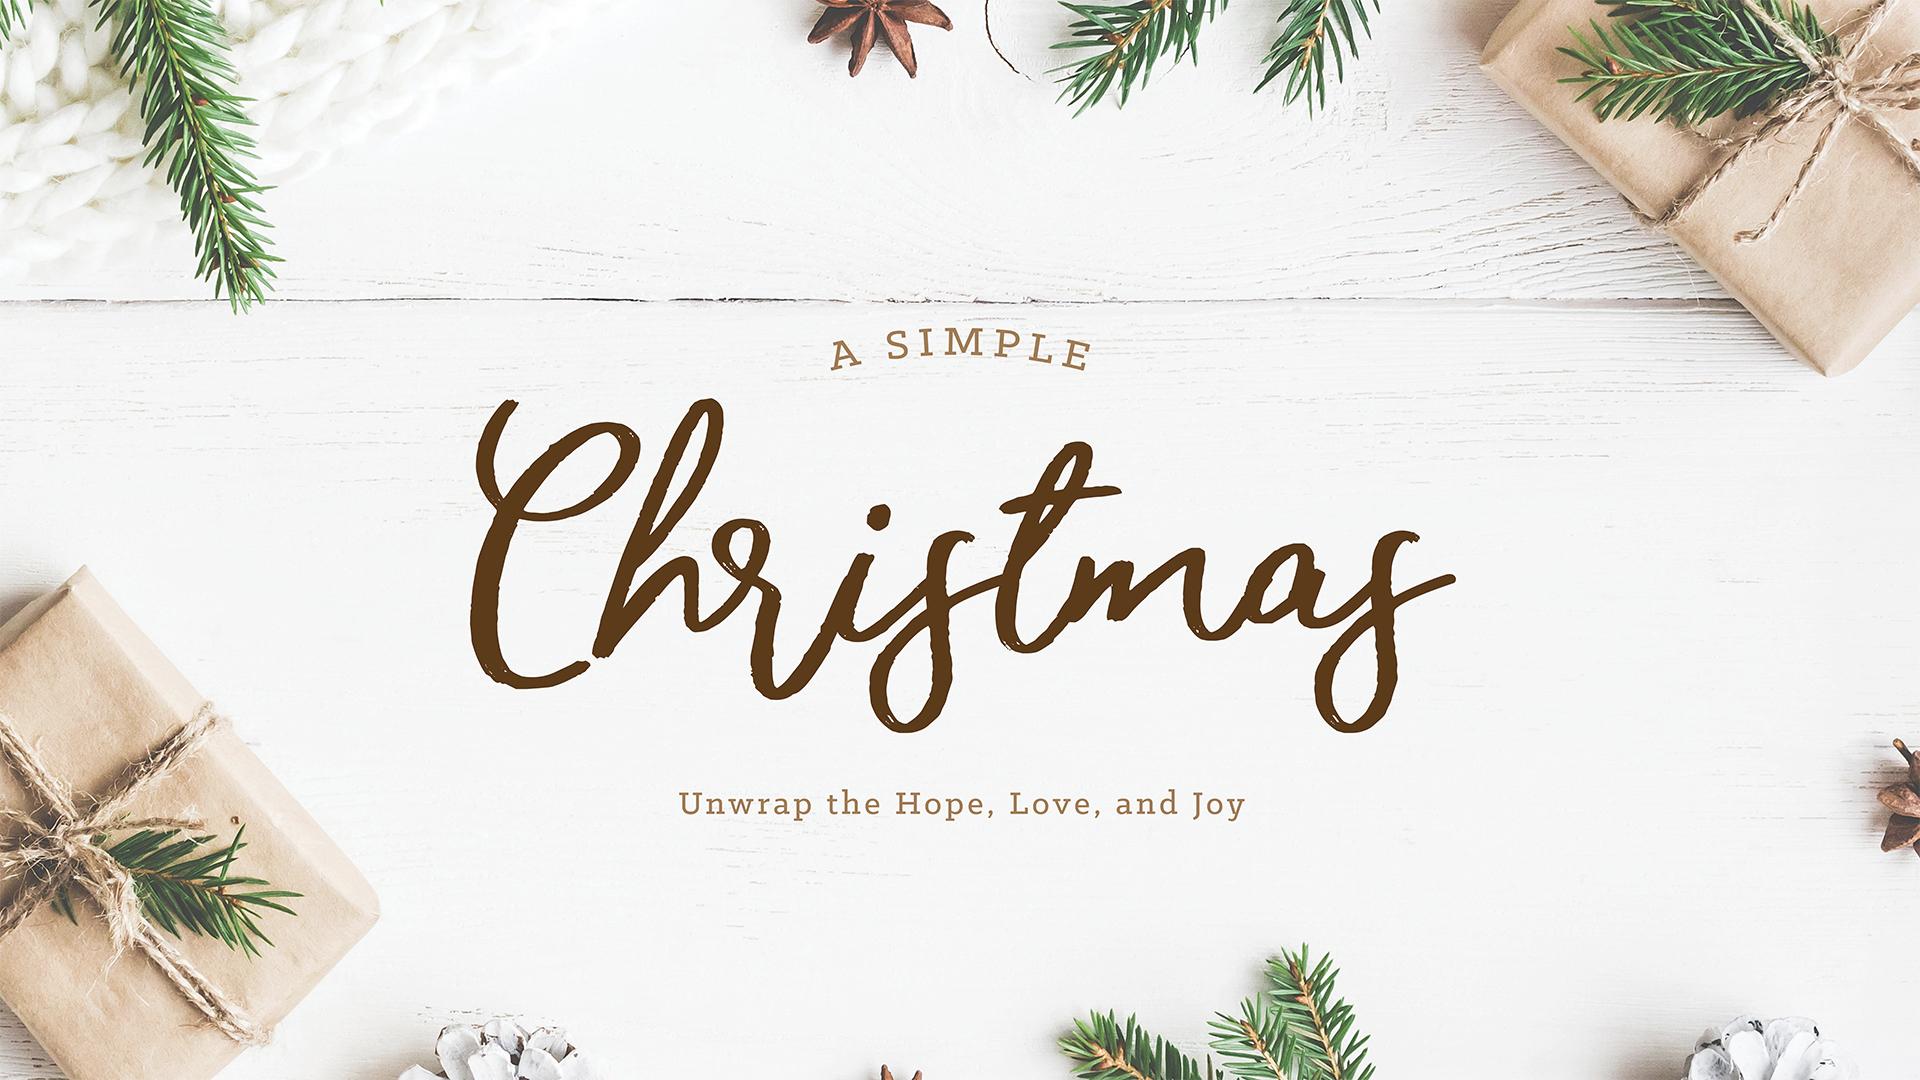 SLIDES_W1 - A Simple Christmas - A Simple Hope.001.jpeg